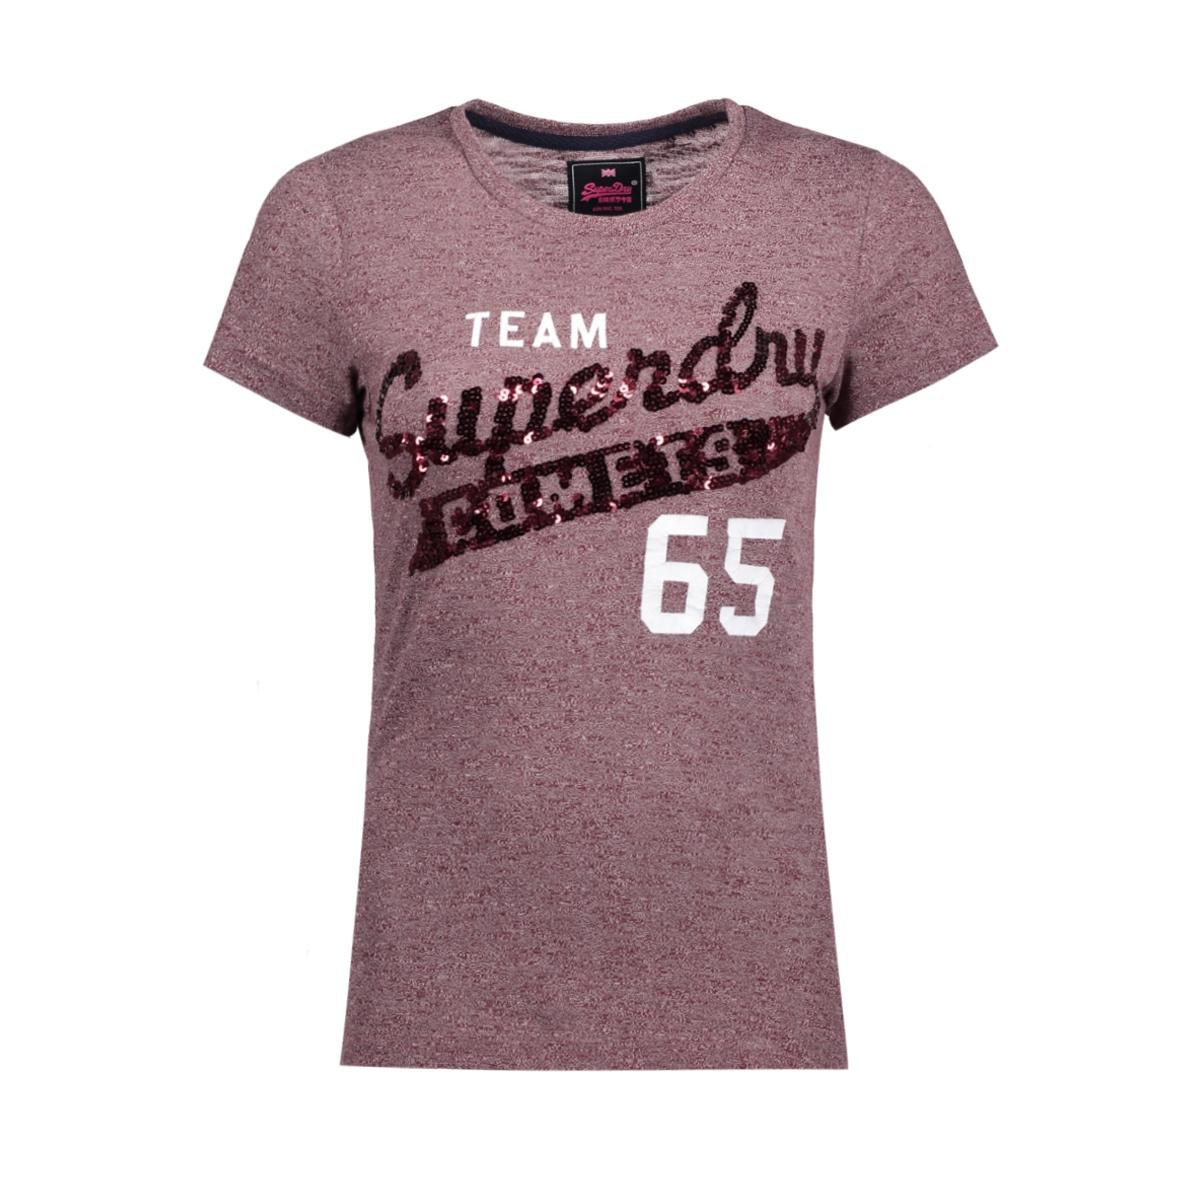 g10008xpf2 team comets superdry t-shirt ii2 egerie grindle